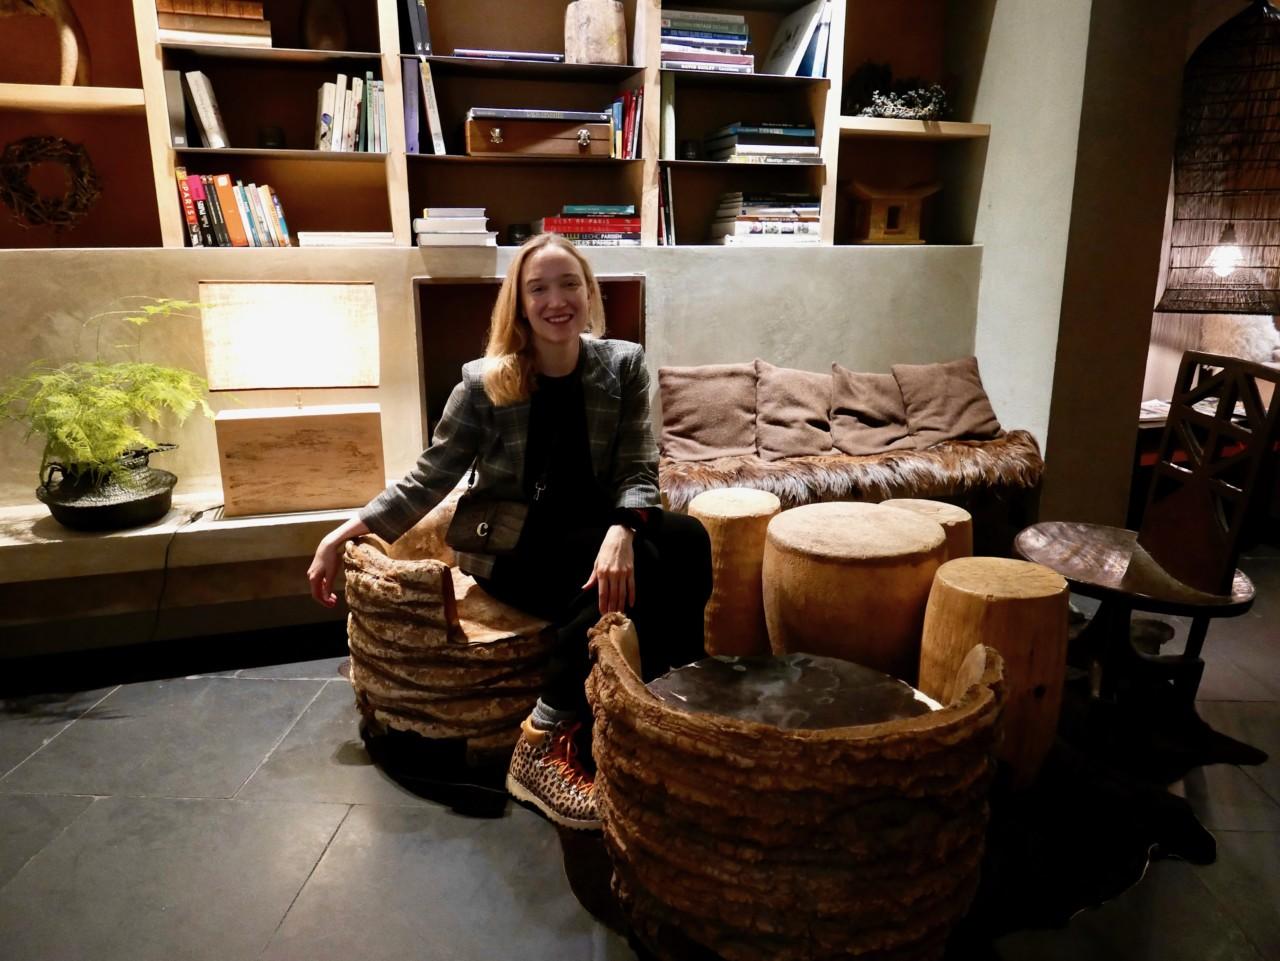 marianne-haugli-lounge-hidden-hotel-paris-green-house